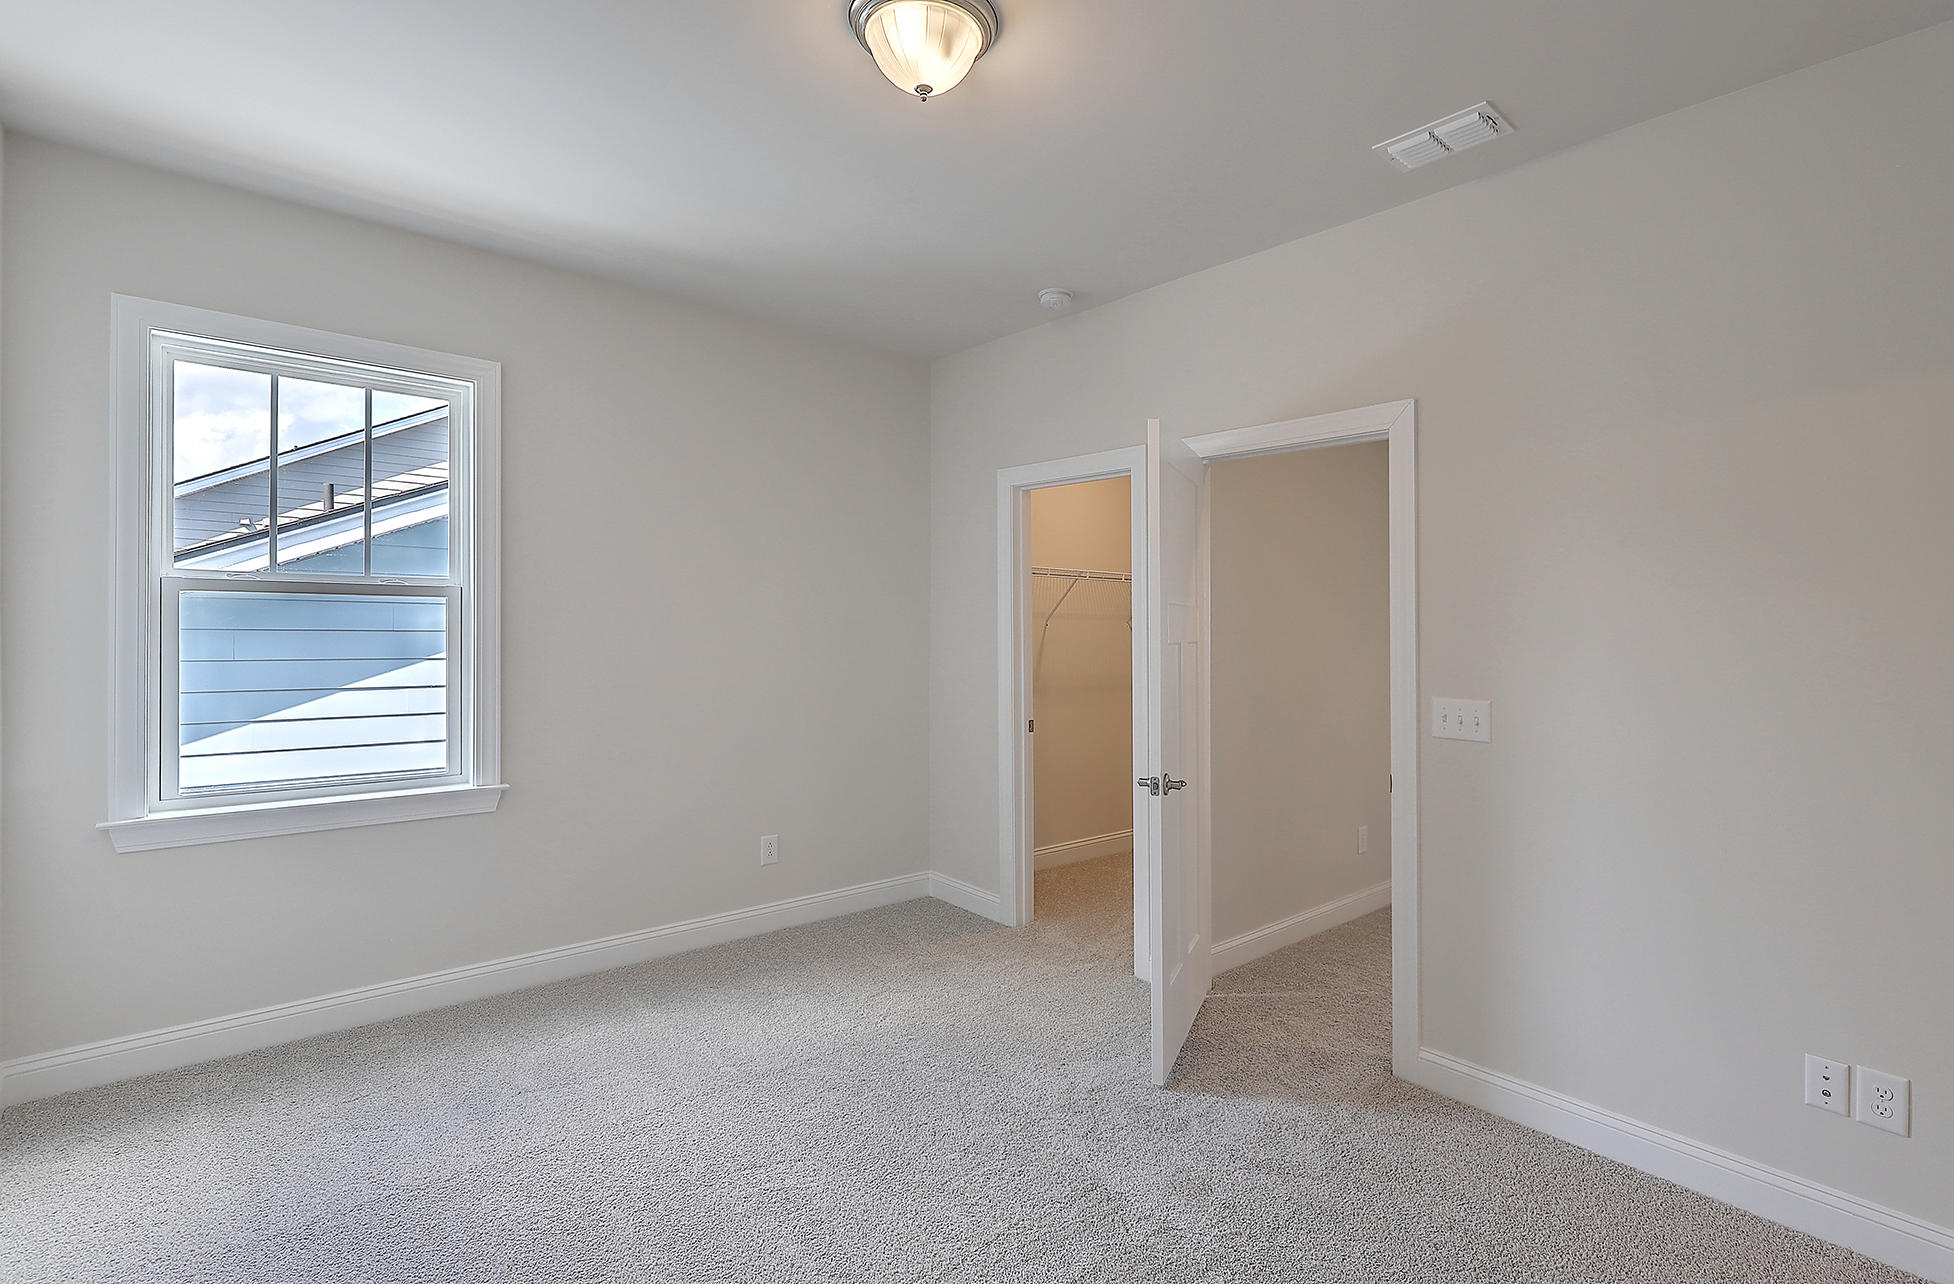 Bentley Park Homes For Sale - 1261 Gannett, Mount Pleasant, SC - 22